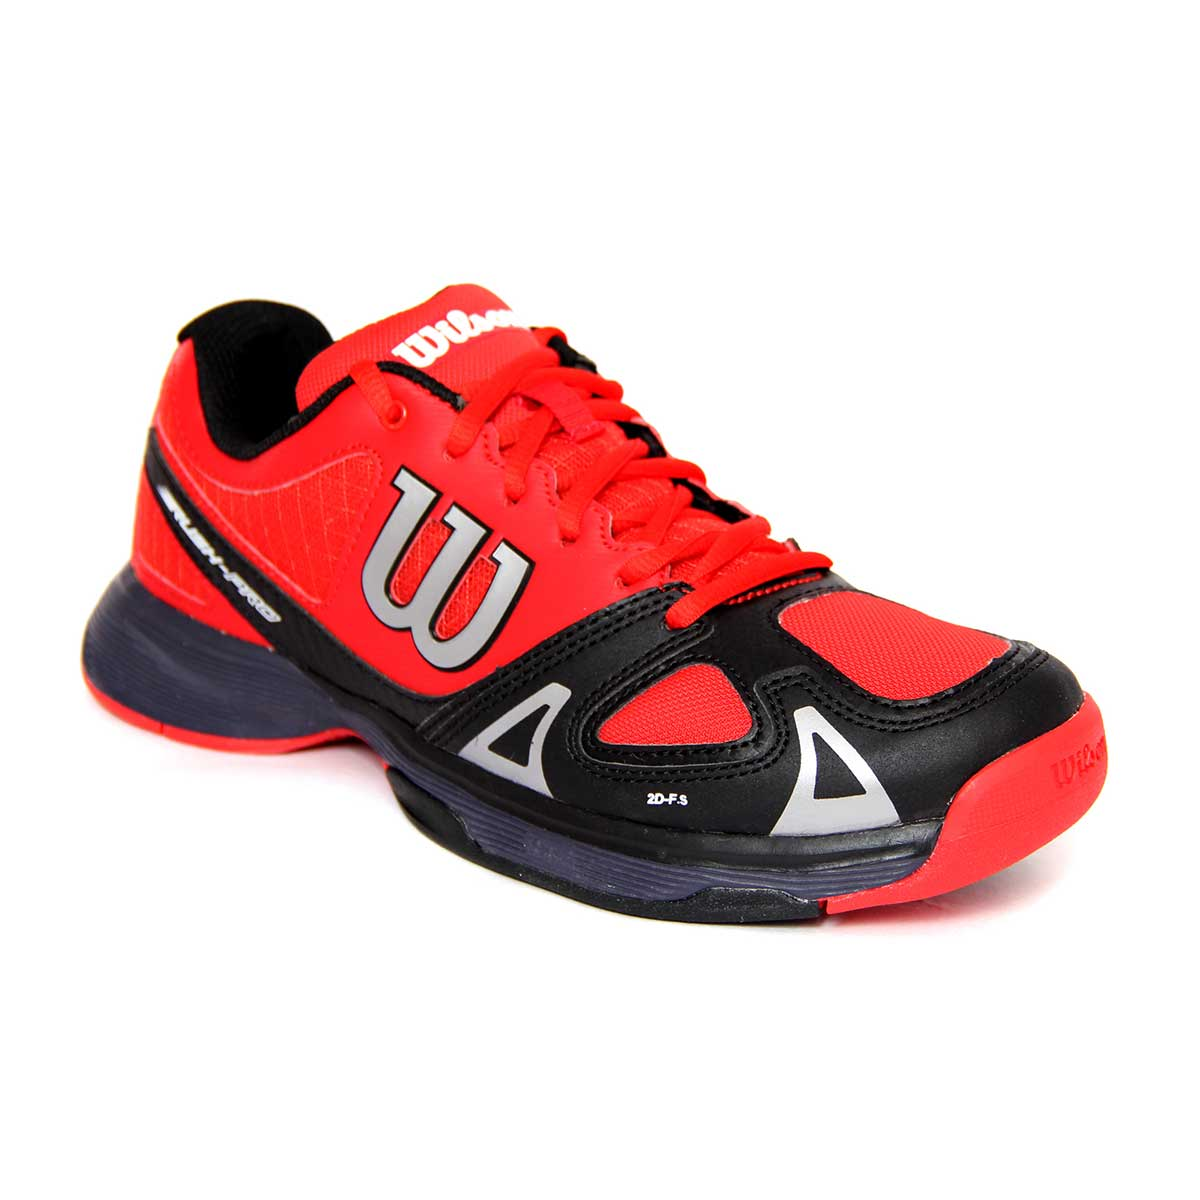 Tennis Shoes, Tennis, Sports, Buy, Wilson, Wilson Rush Pro Junior Tennis  Shoes (Red/Black)